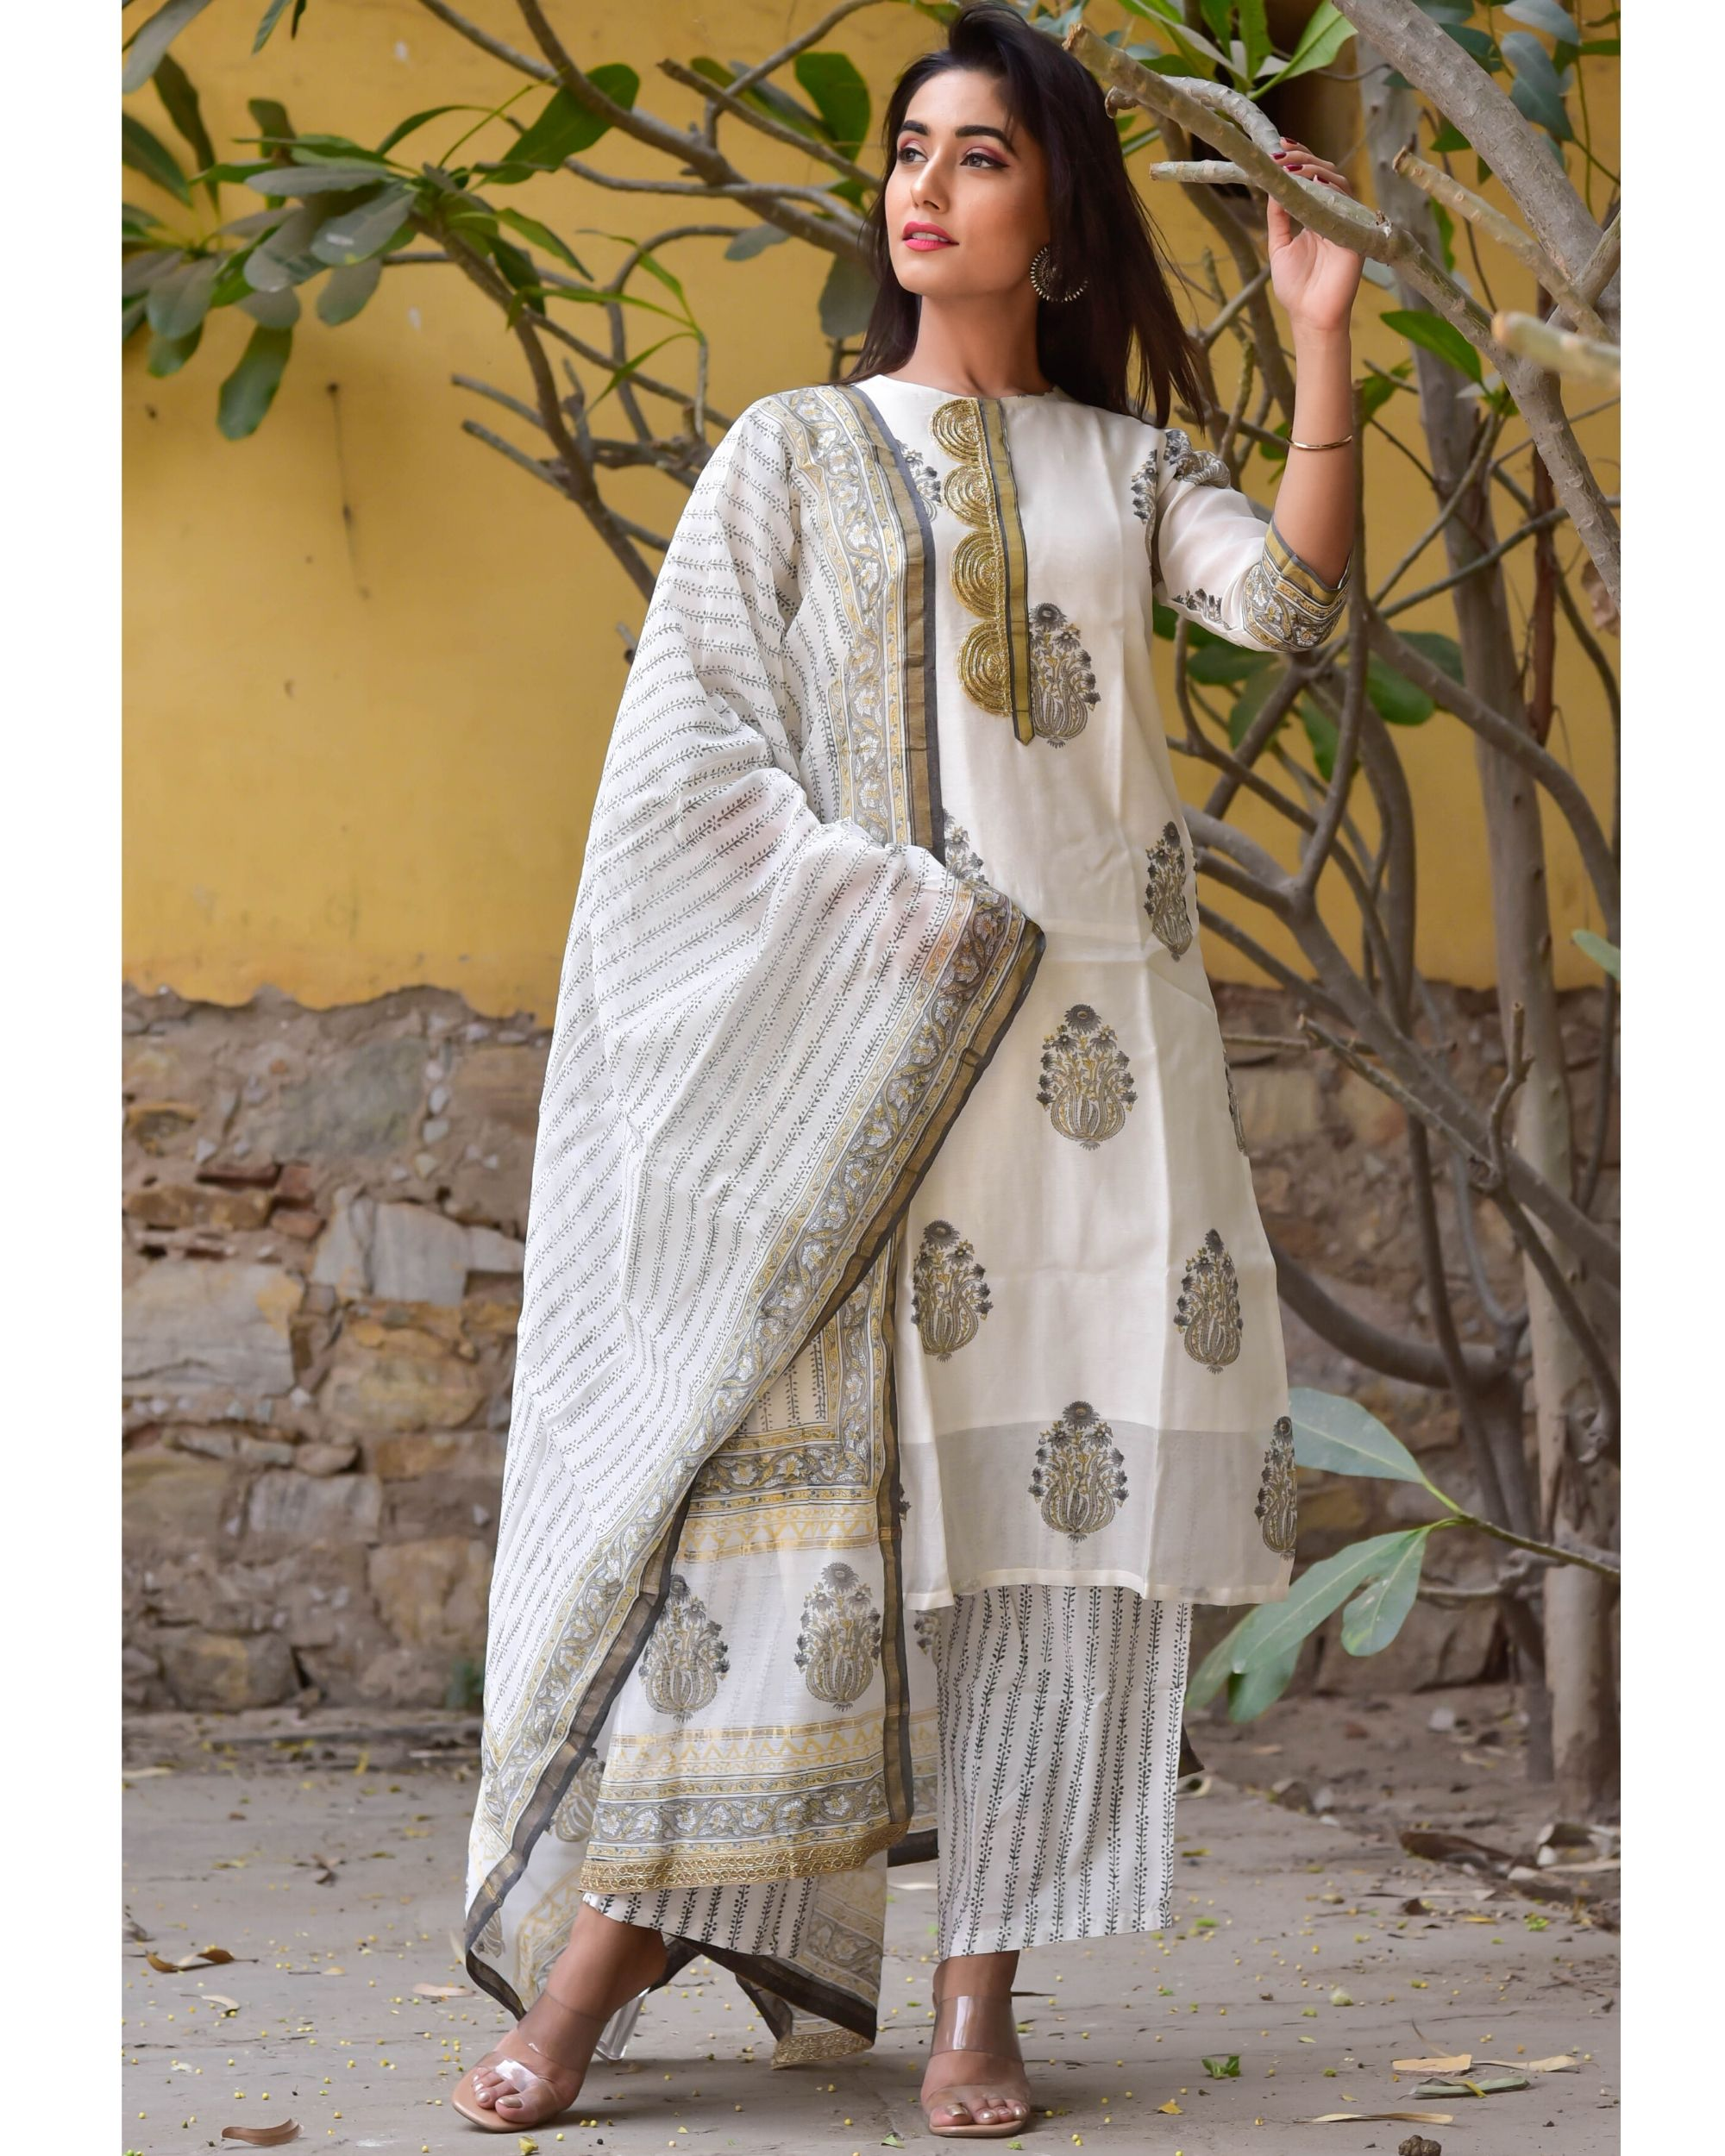 Grey and white mughal gota kurta and pants with dupatta- Set Of Three